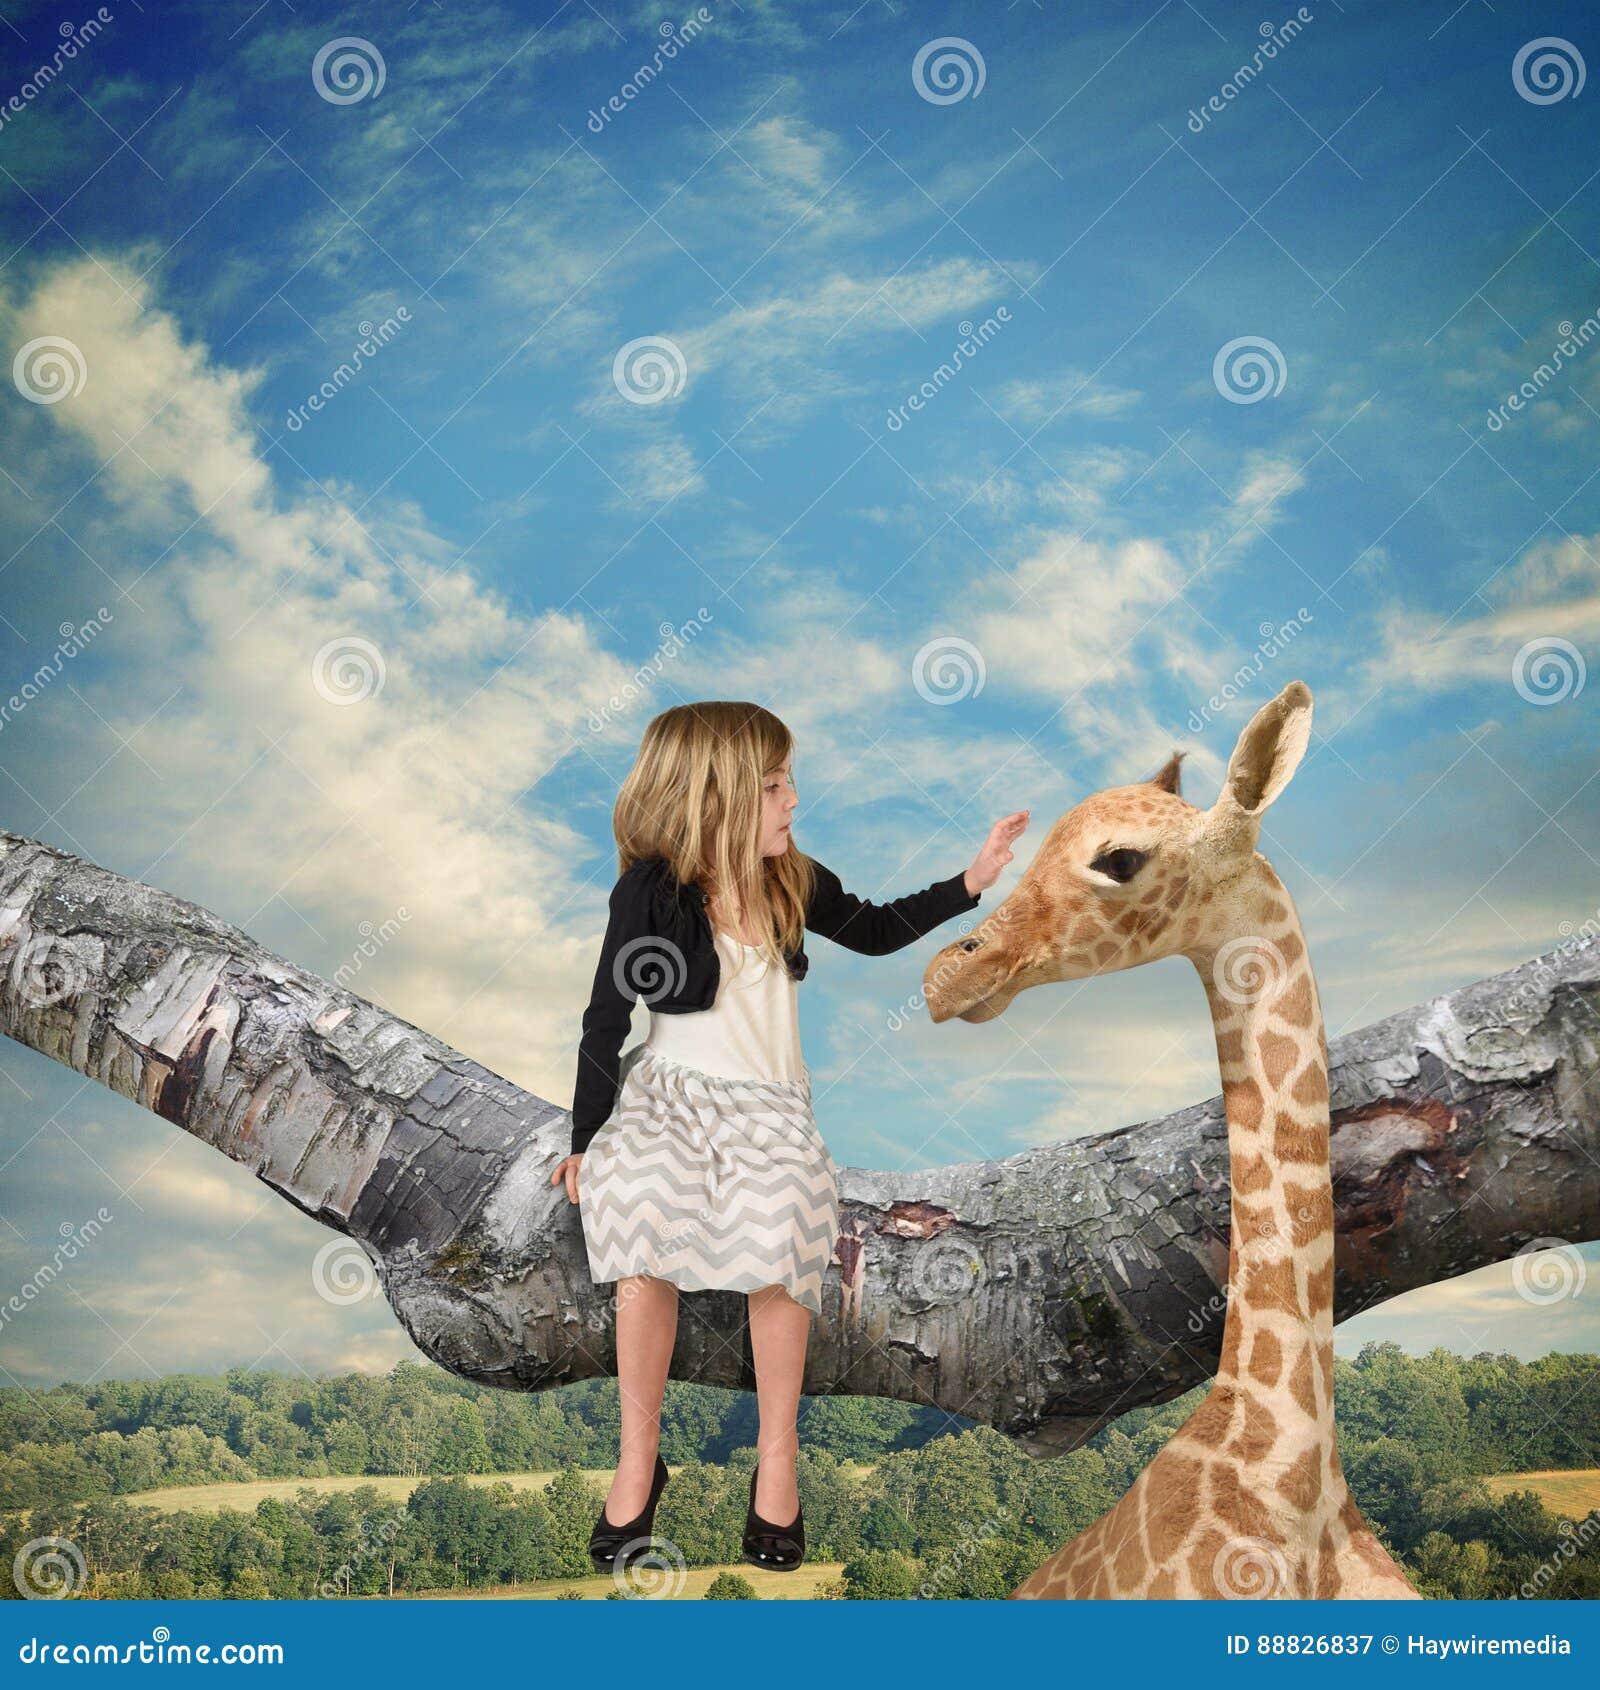 Child Petting Giraffe Animal on Tree Branch